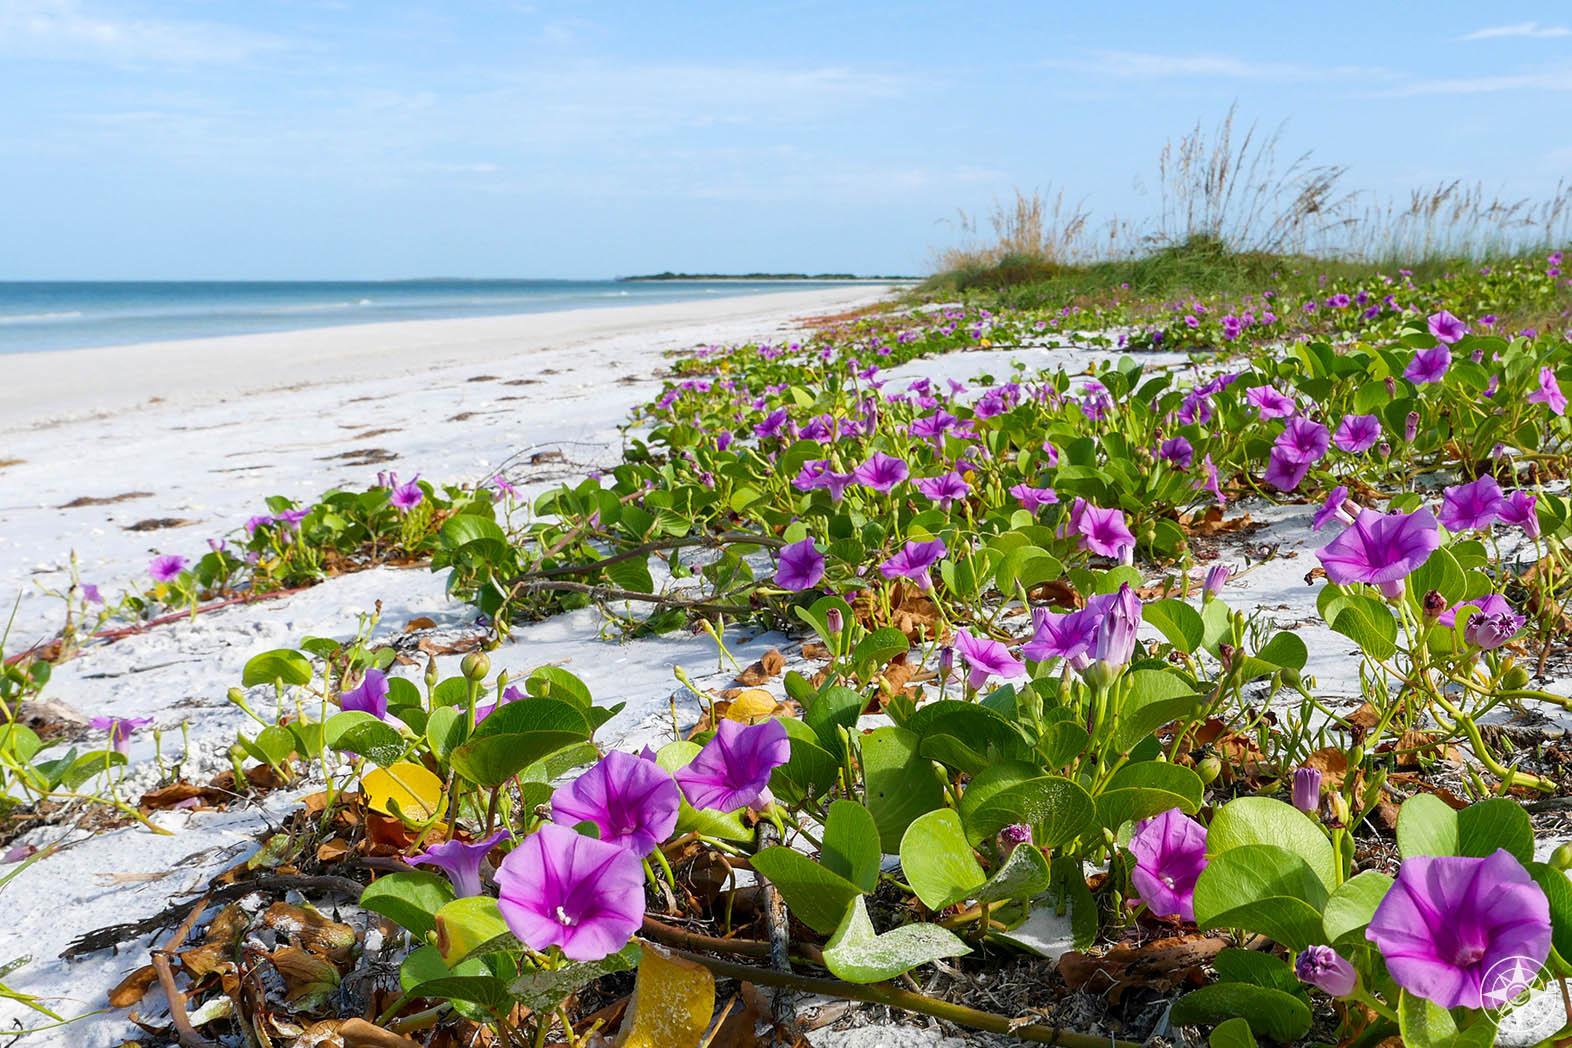 Natural Beach Paradise: beach morning glory, sea oats, birds, and wide white beach, Honeymoon Island State Park, Florida